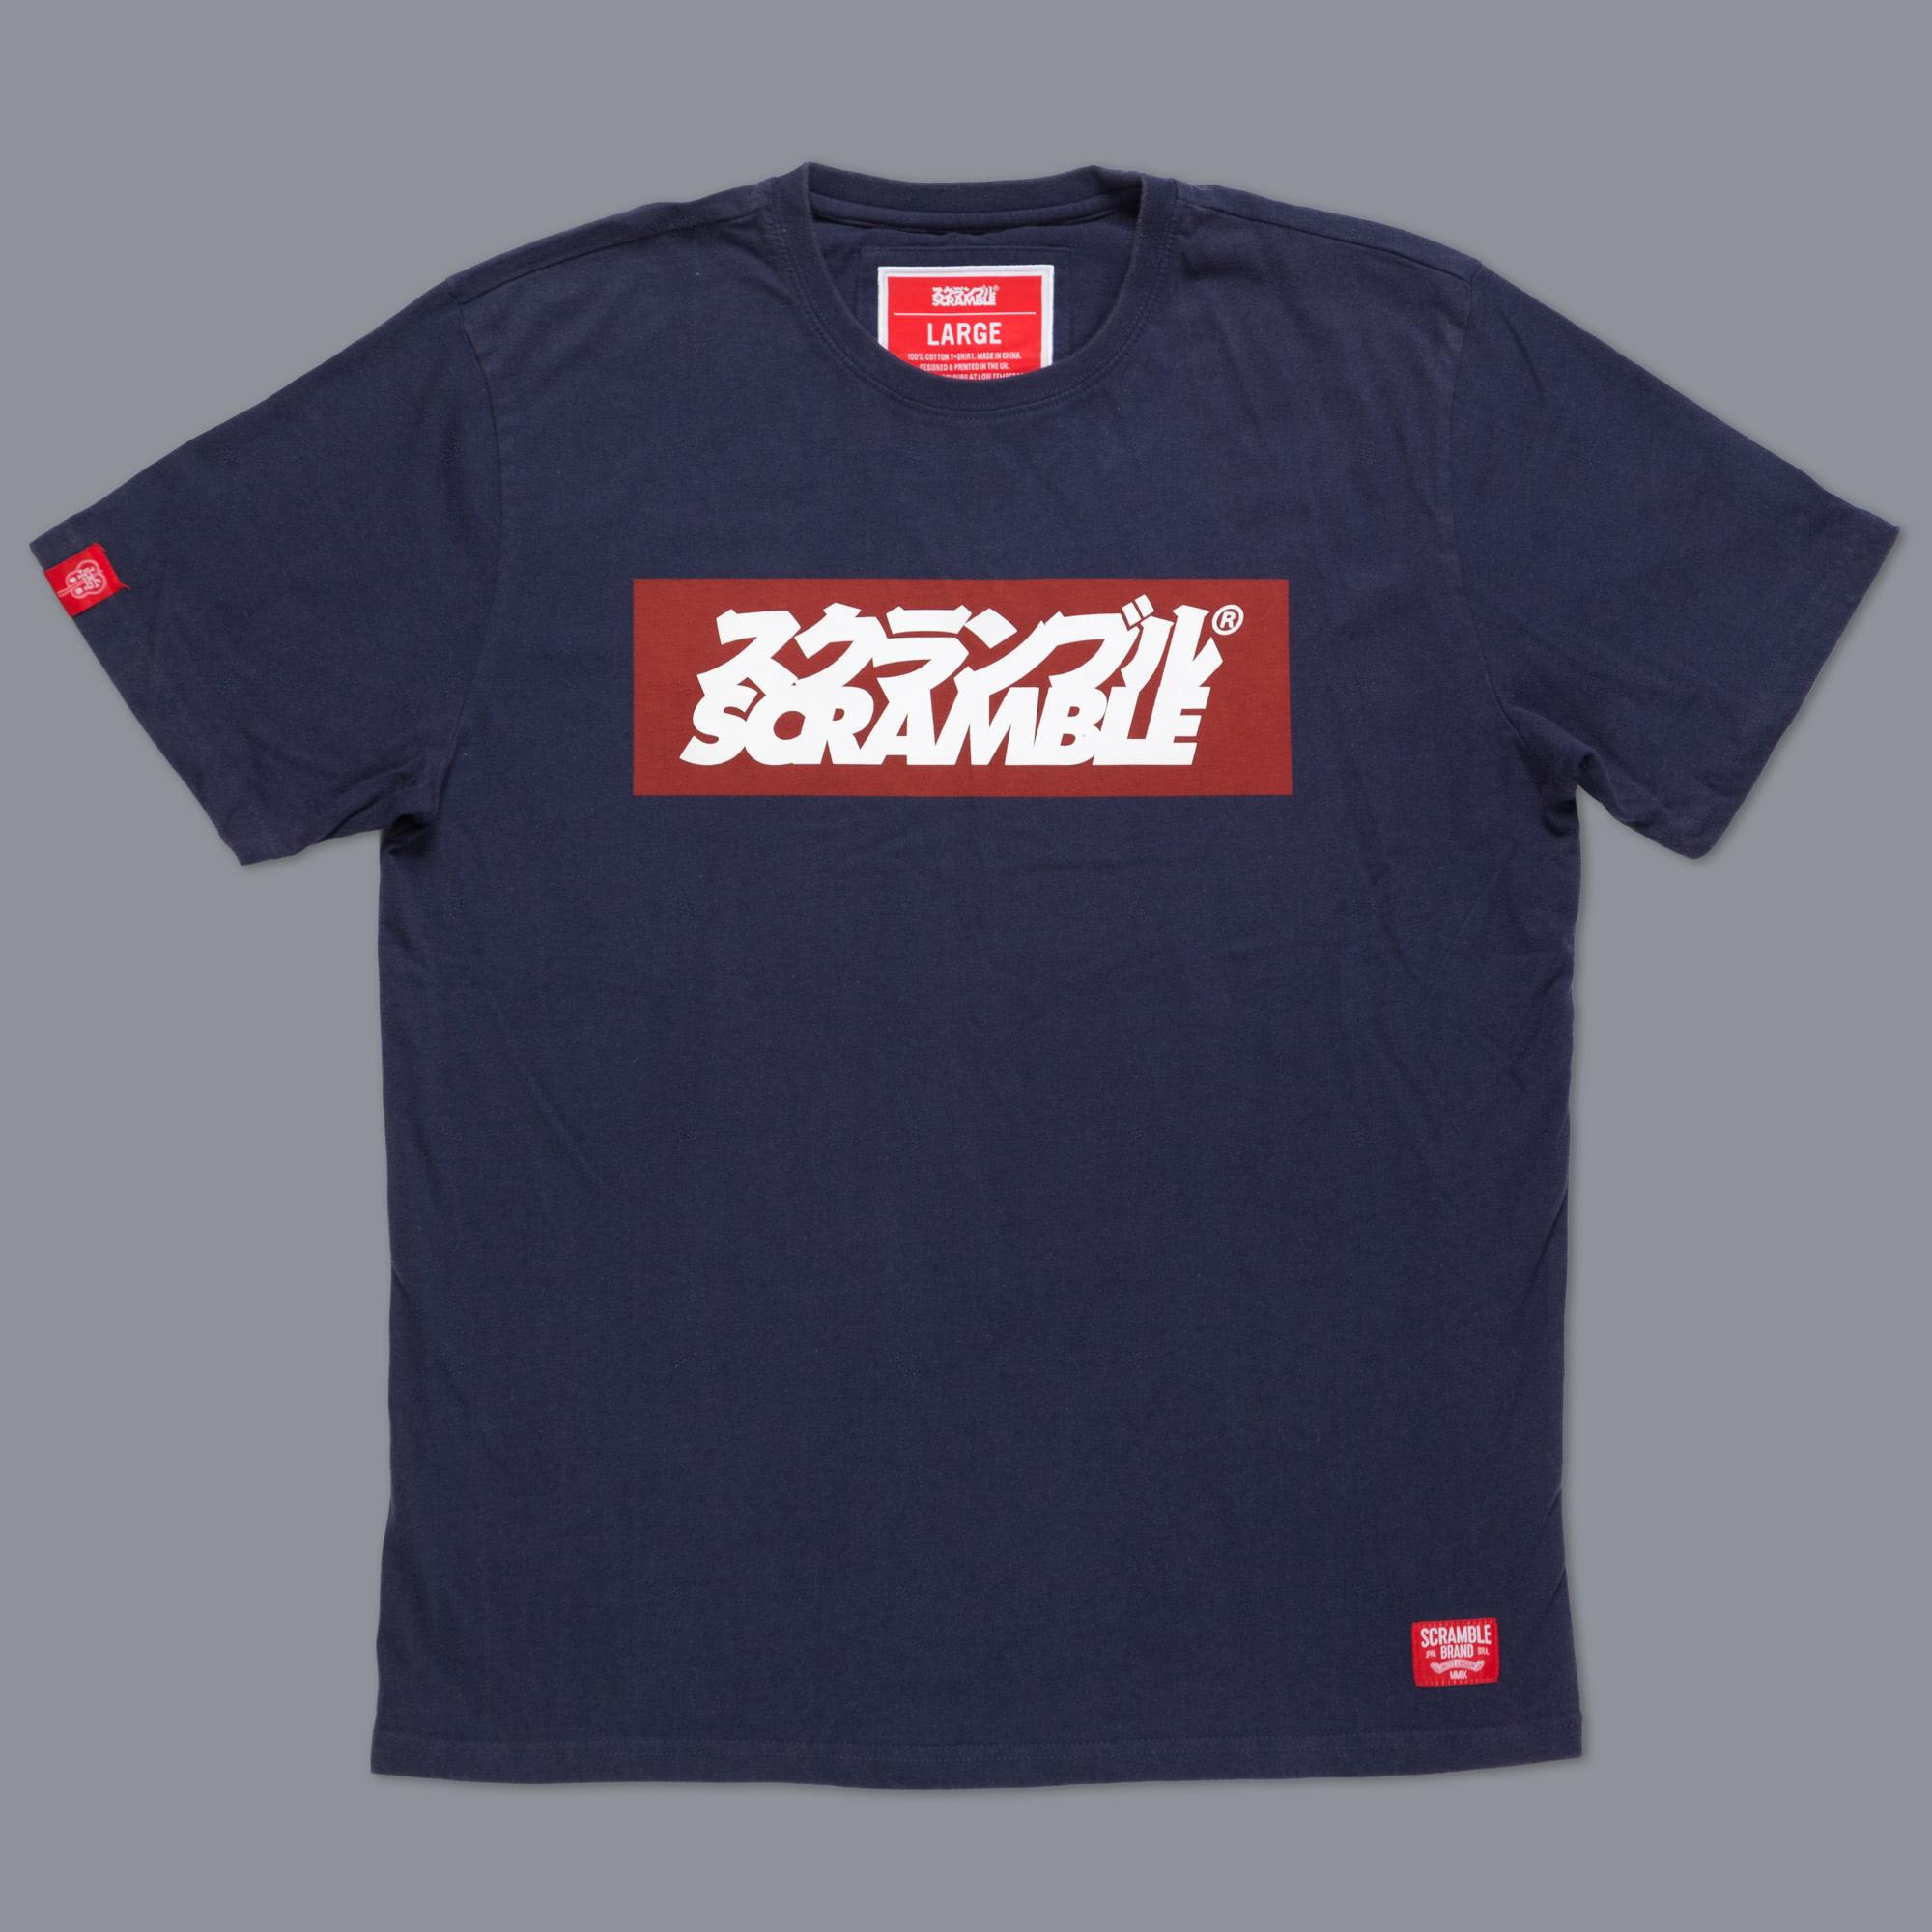 SCRAMBLE ブランドロゴ Tシャツ – ネイビー